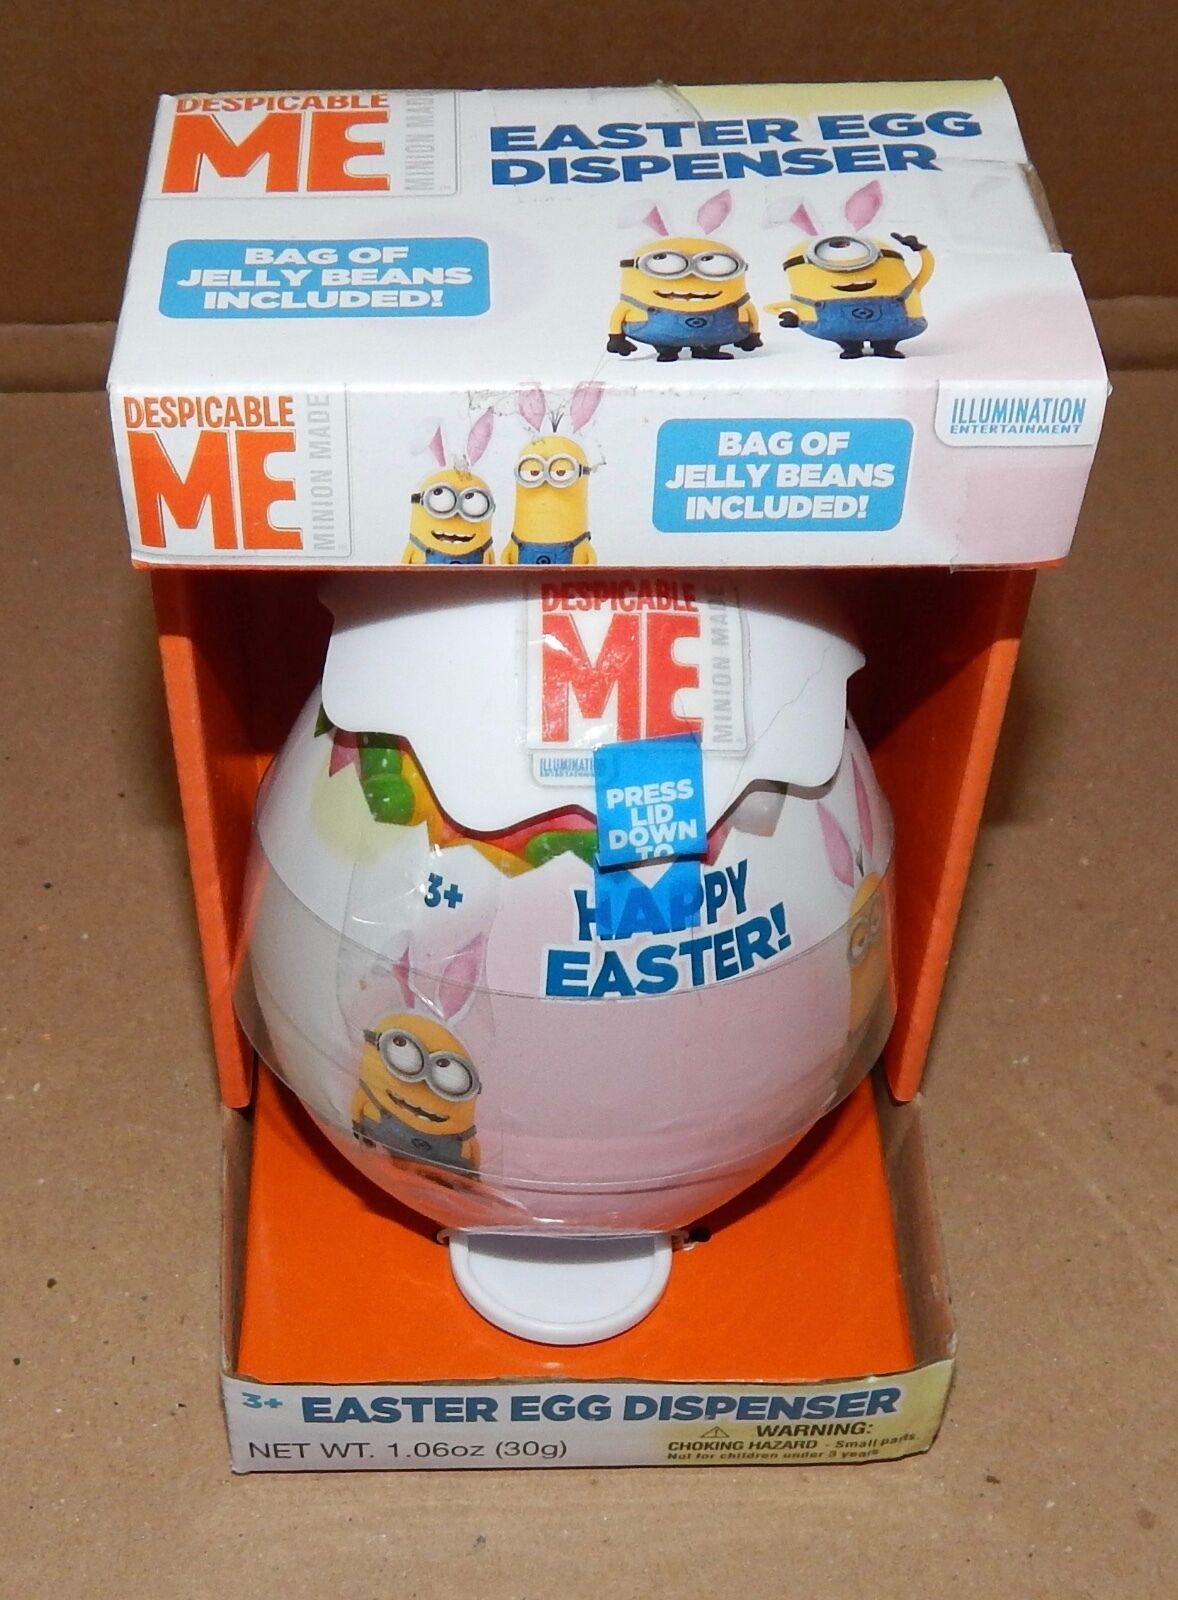 Despicable Me Minions Easter Egg Dispenser